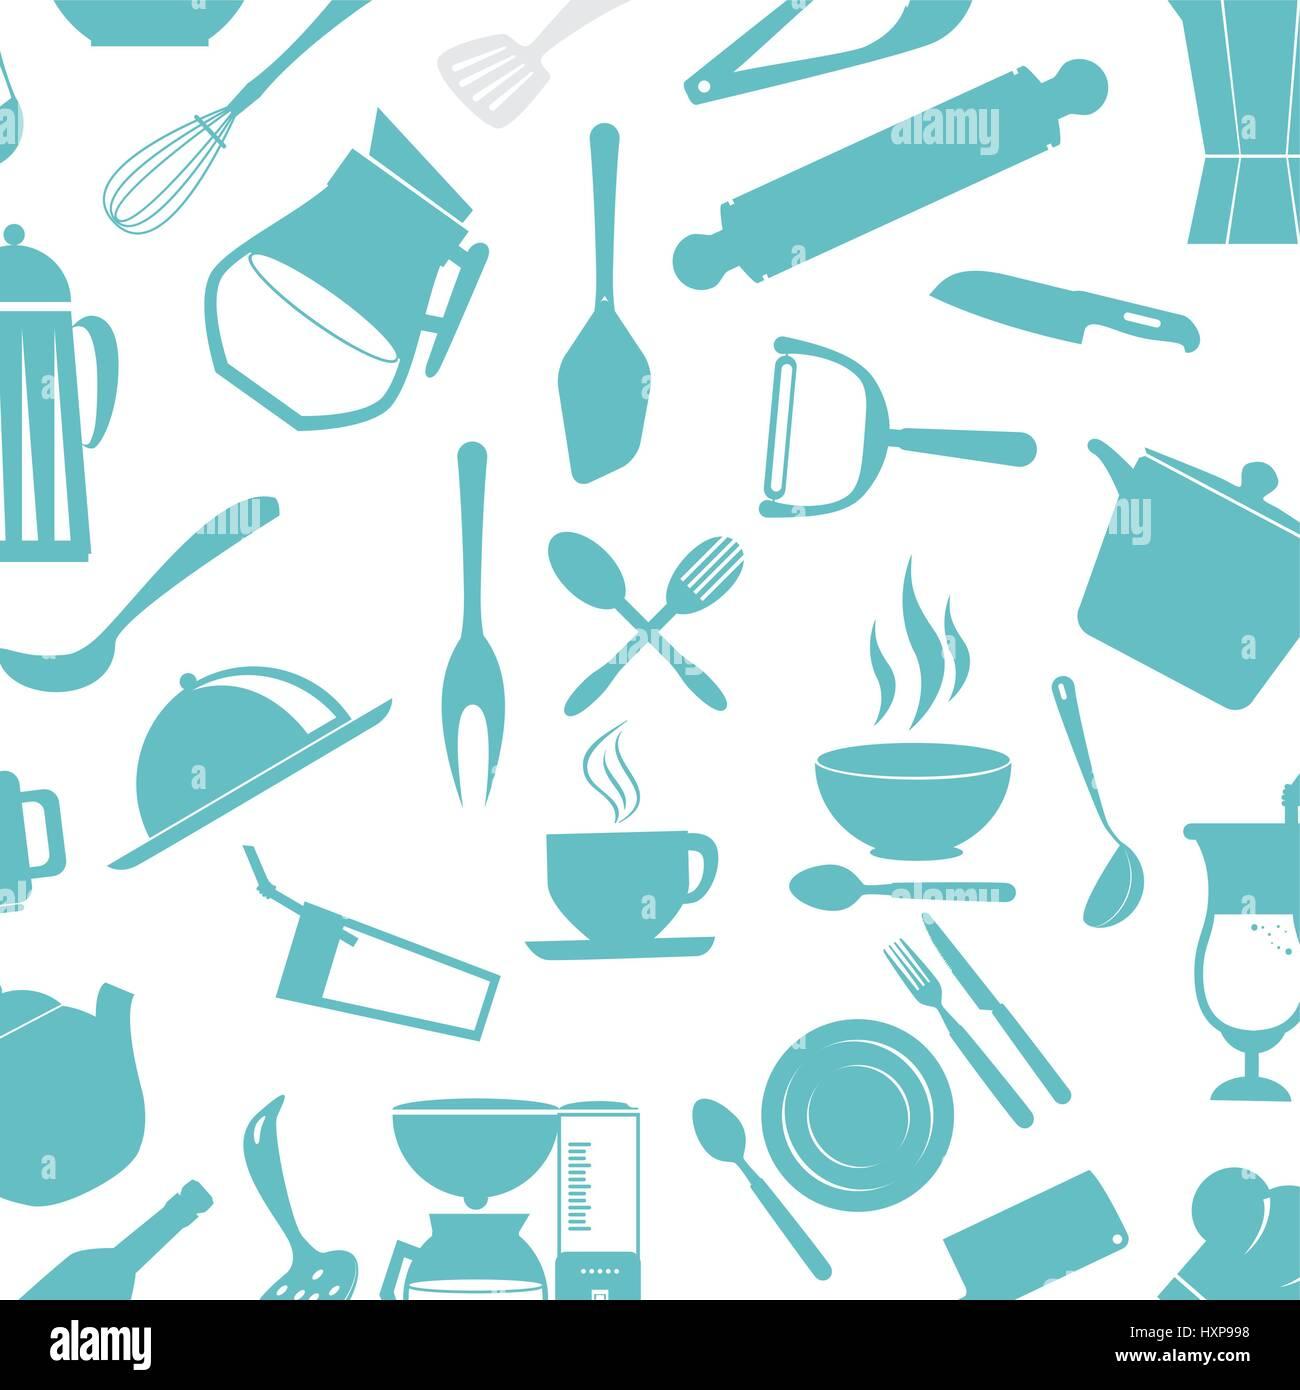 kitchen cutlery tools icons Stock Vector Art & Illustration, Vector ...